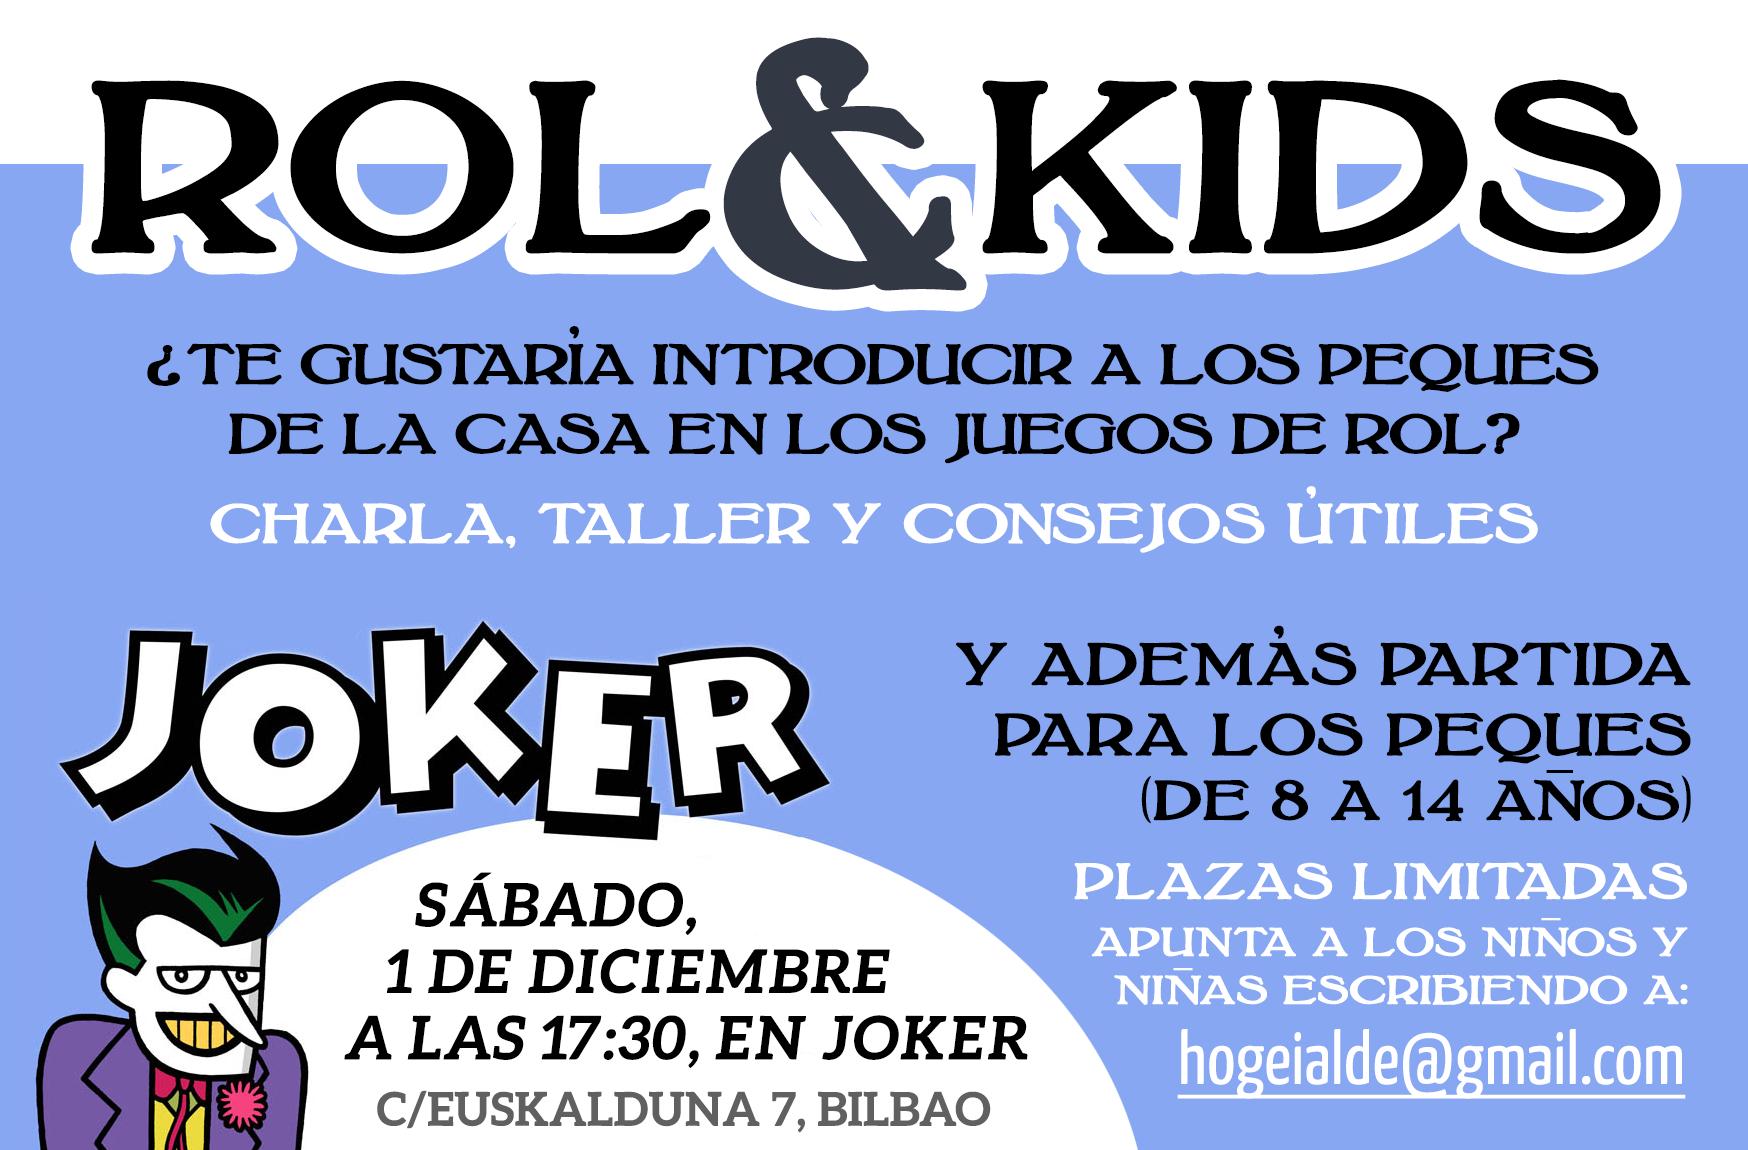 ROL&KIDS